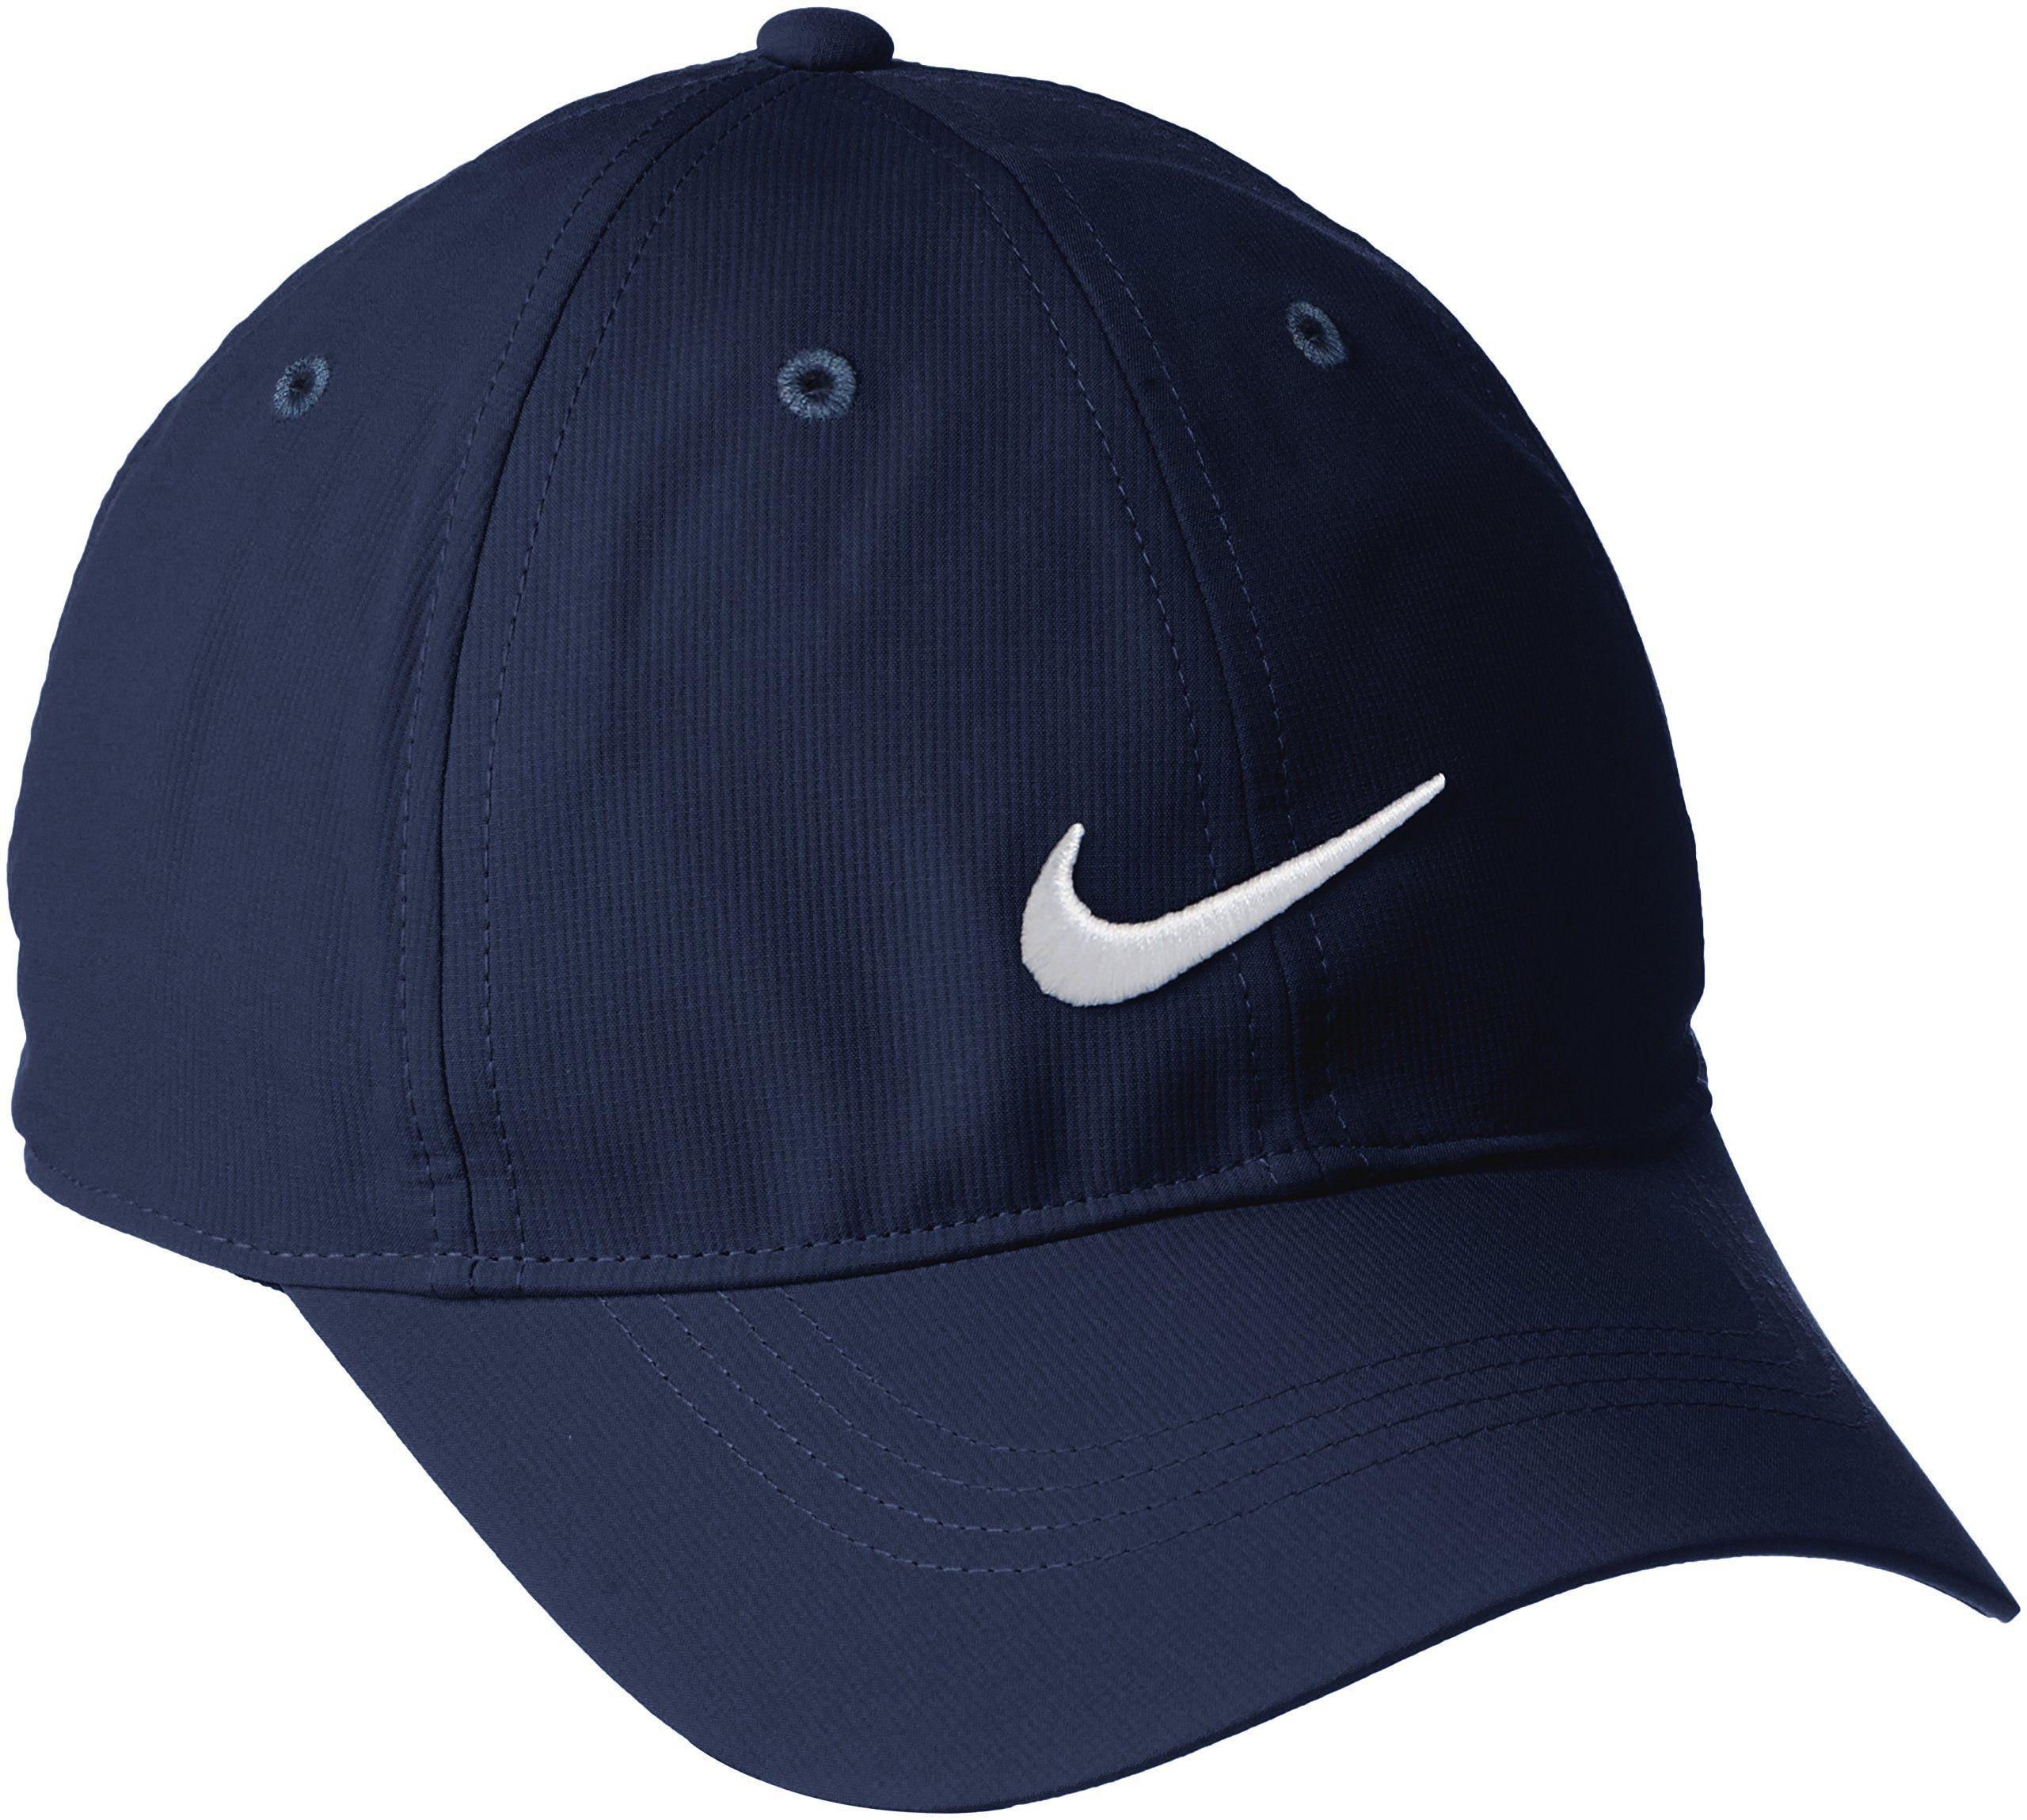 9e1f2198f9562 Women Golf Clothing - Nike Unisex Legacy 91 Tech Cap Midnight Navy WhiteOne  Size